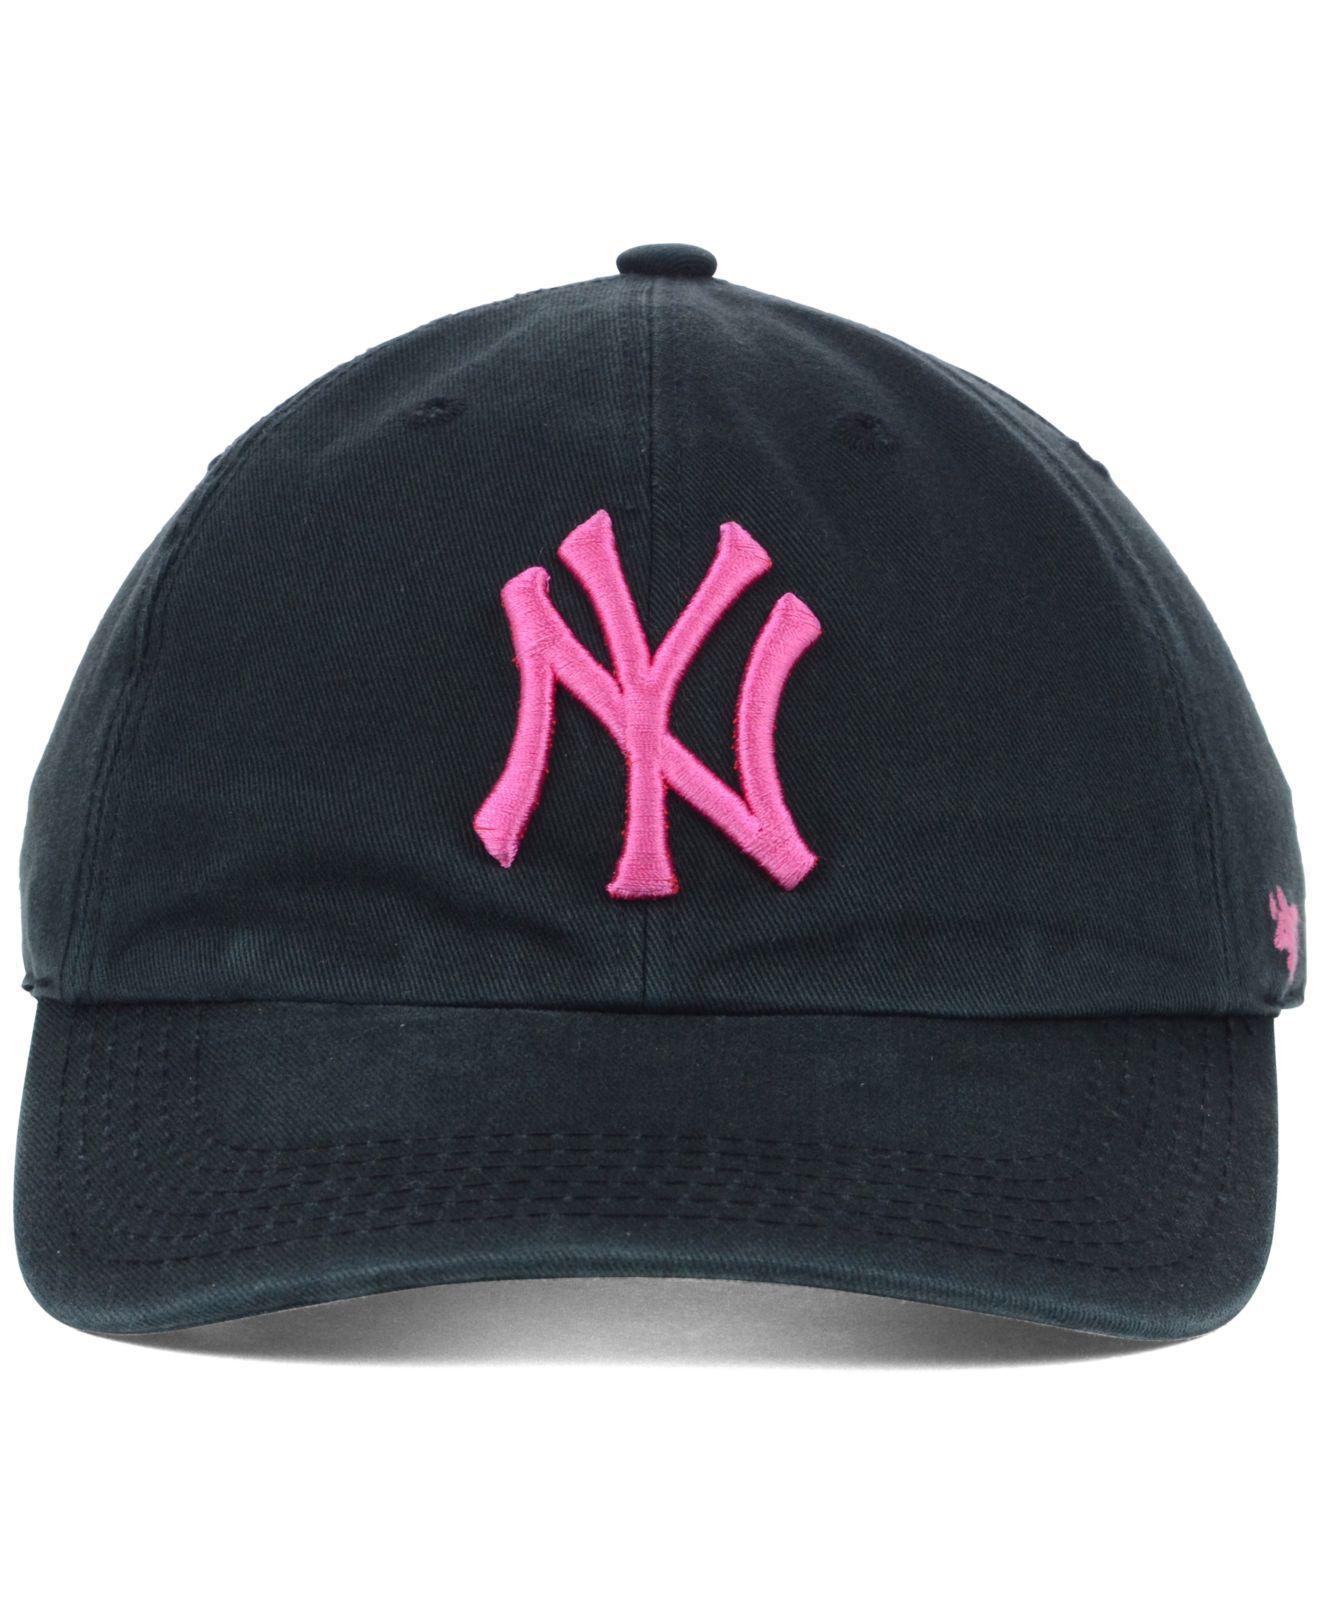 2c49c9df26b53 Lyst - 47 Brand New York Yankees Clean Up Cap in Black for Men